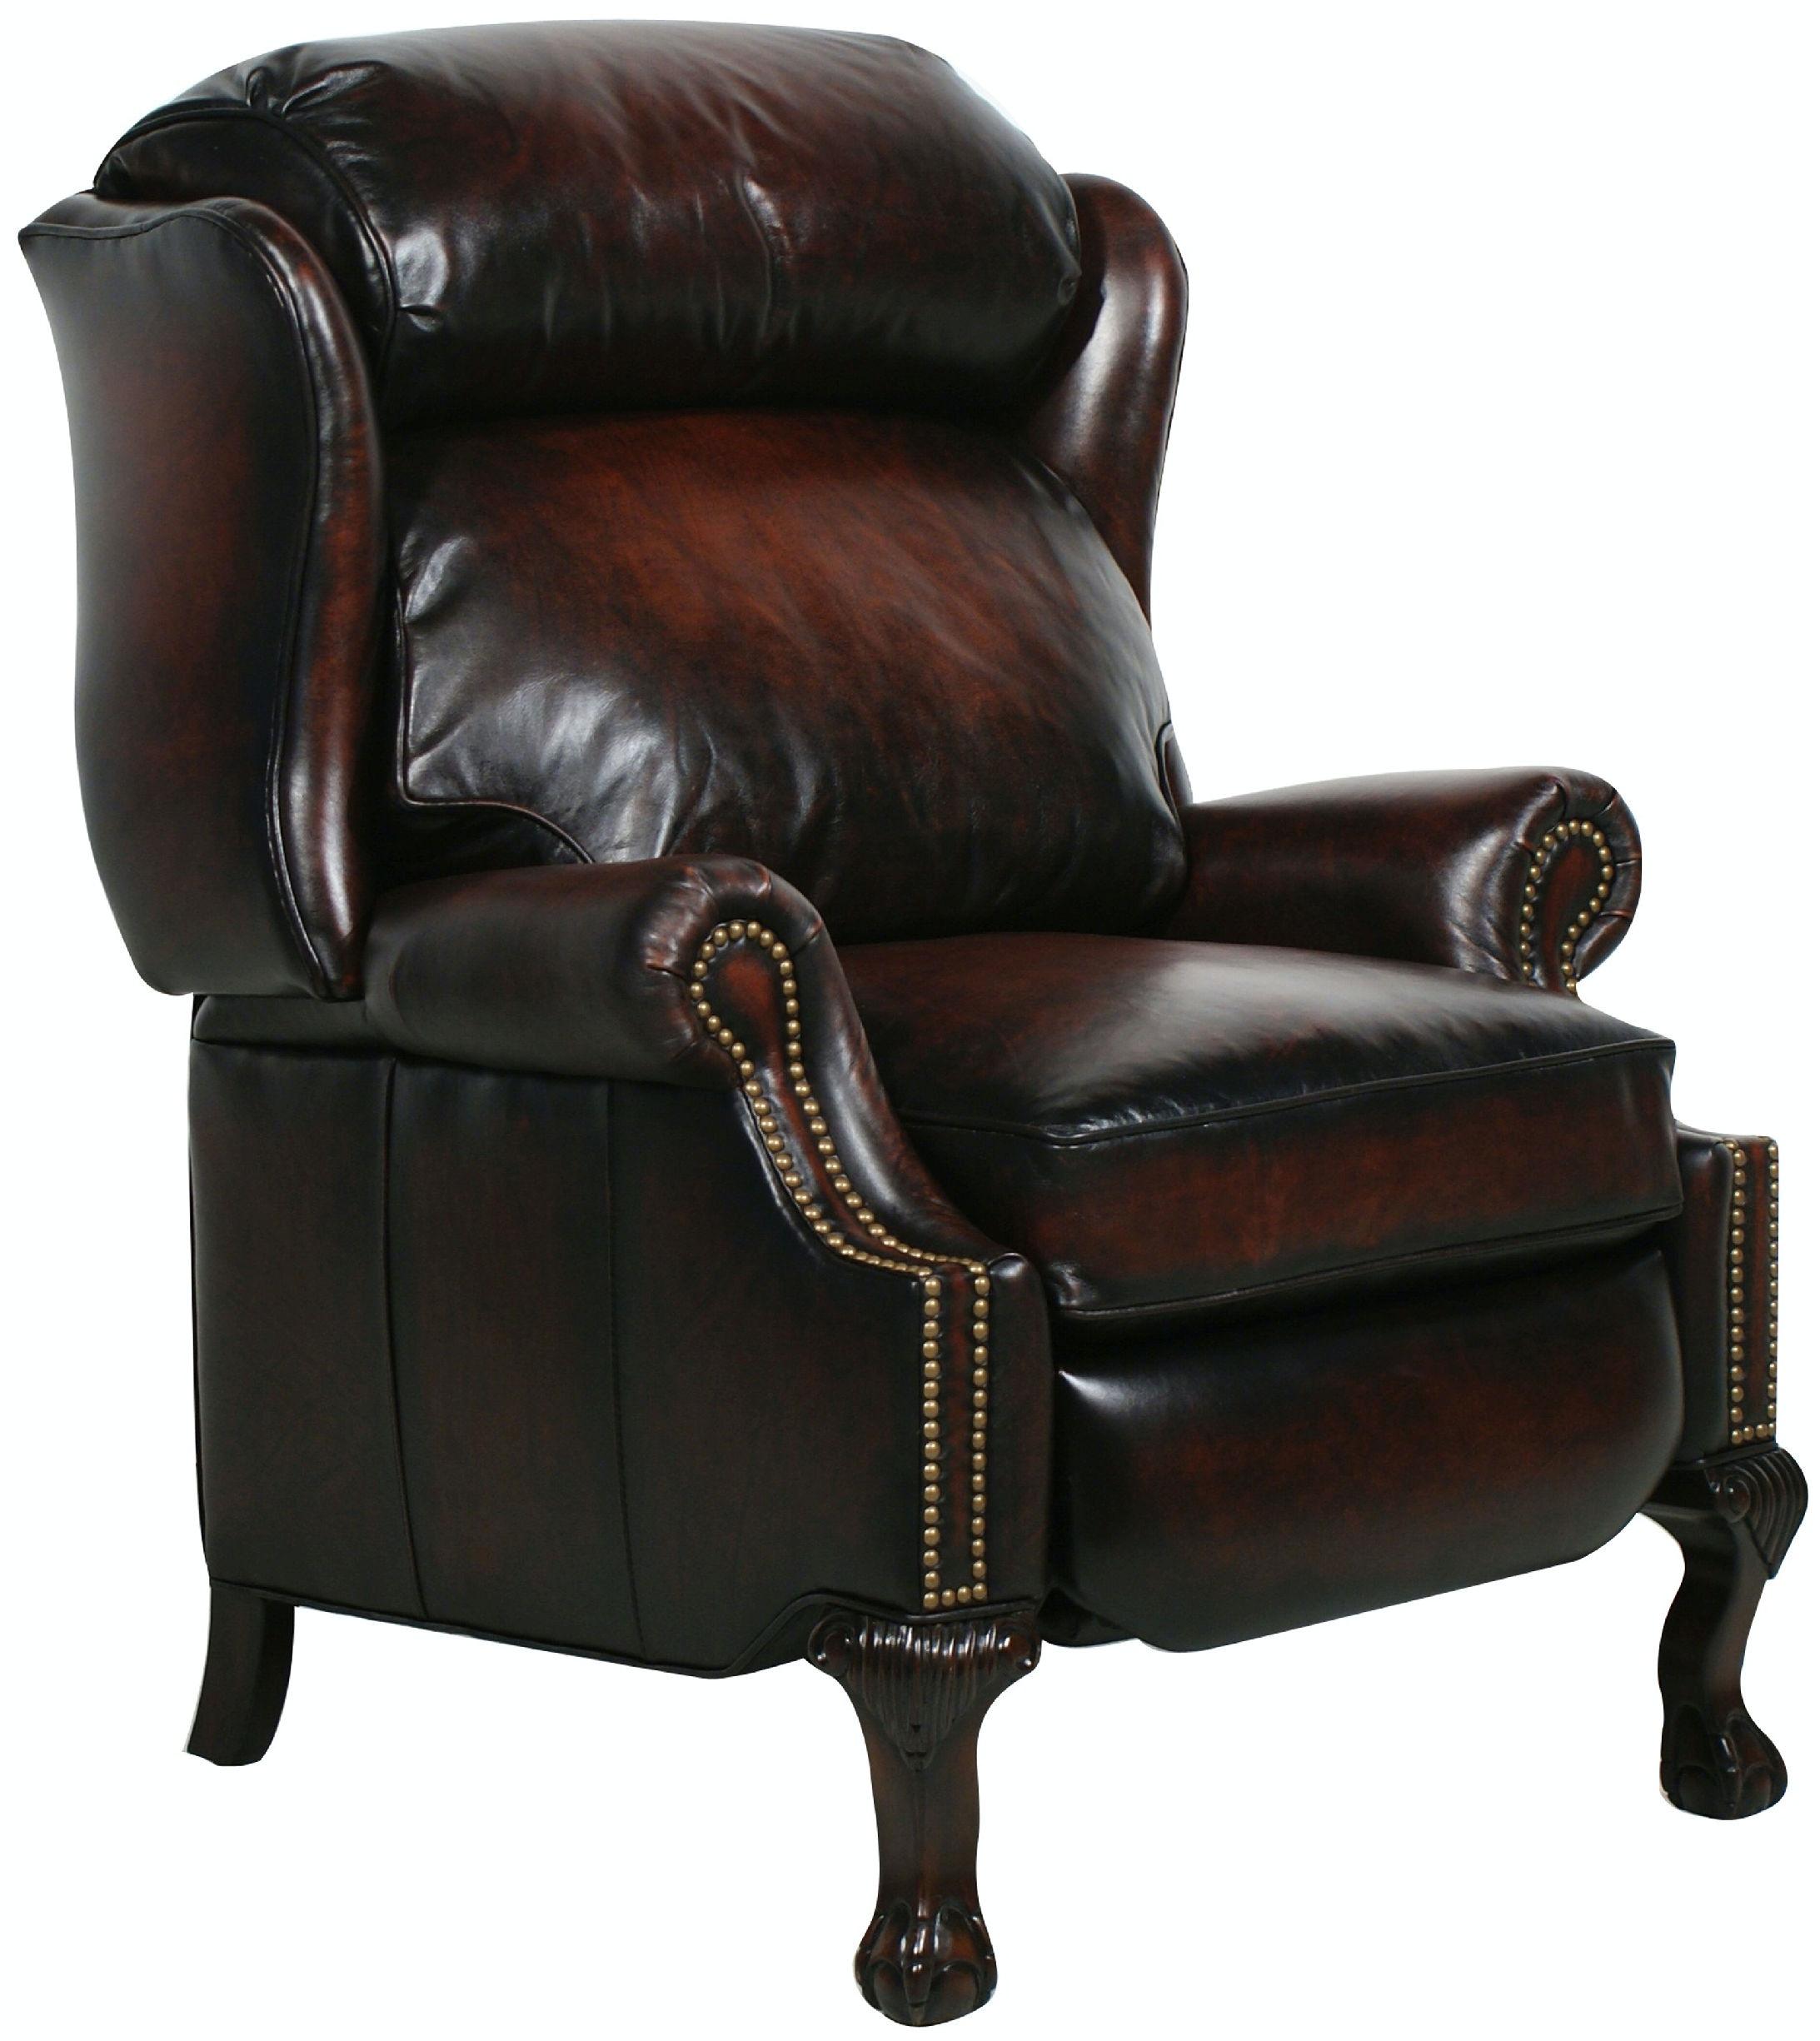 Danbury Leather Recliner